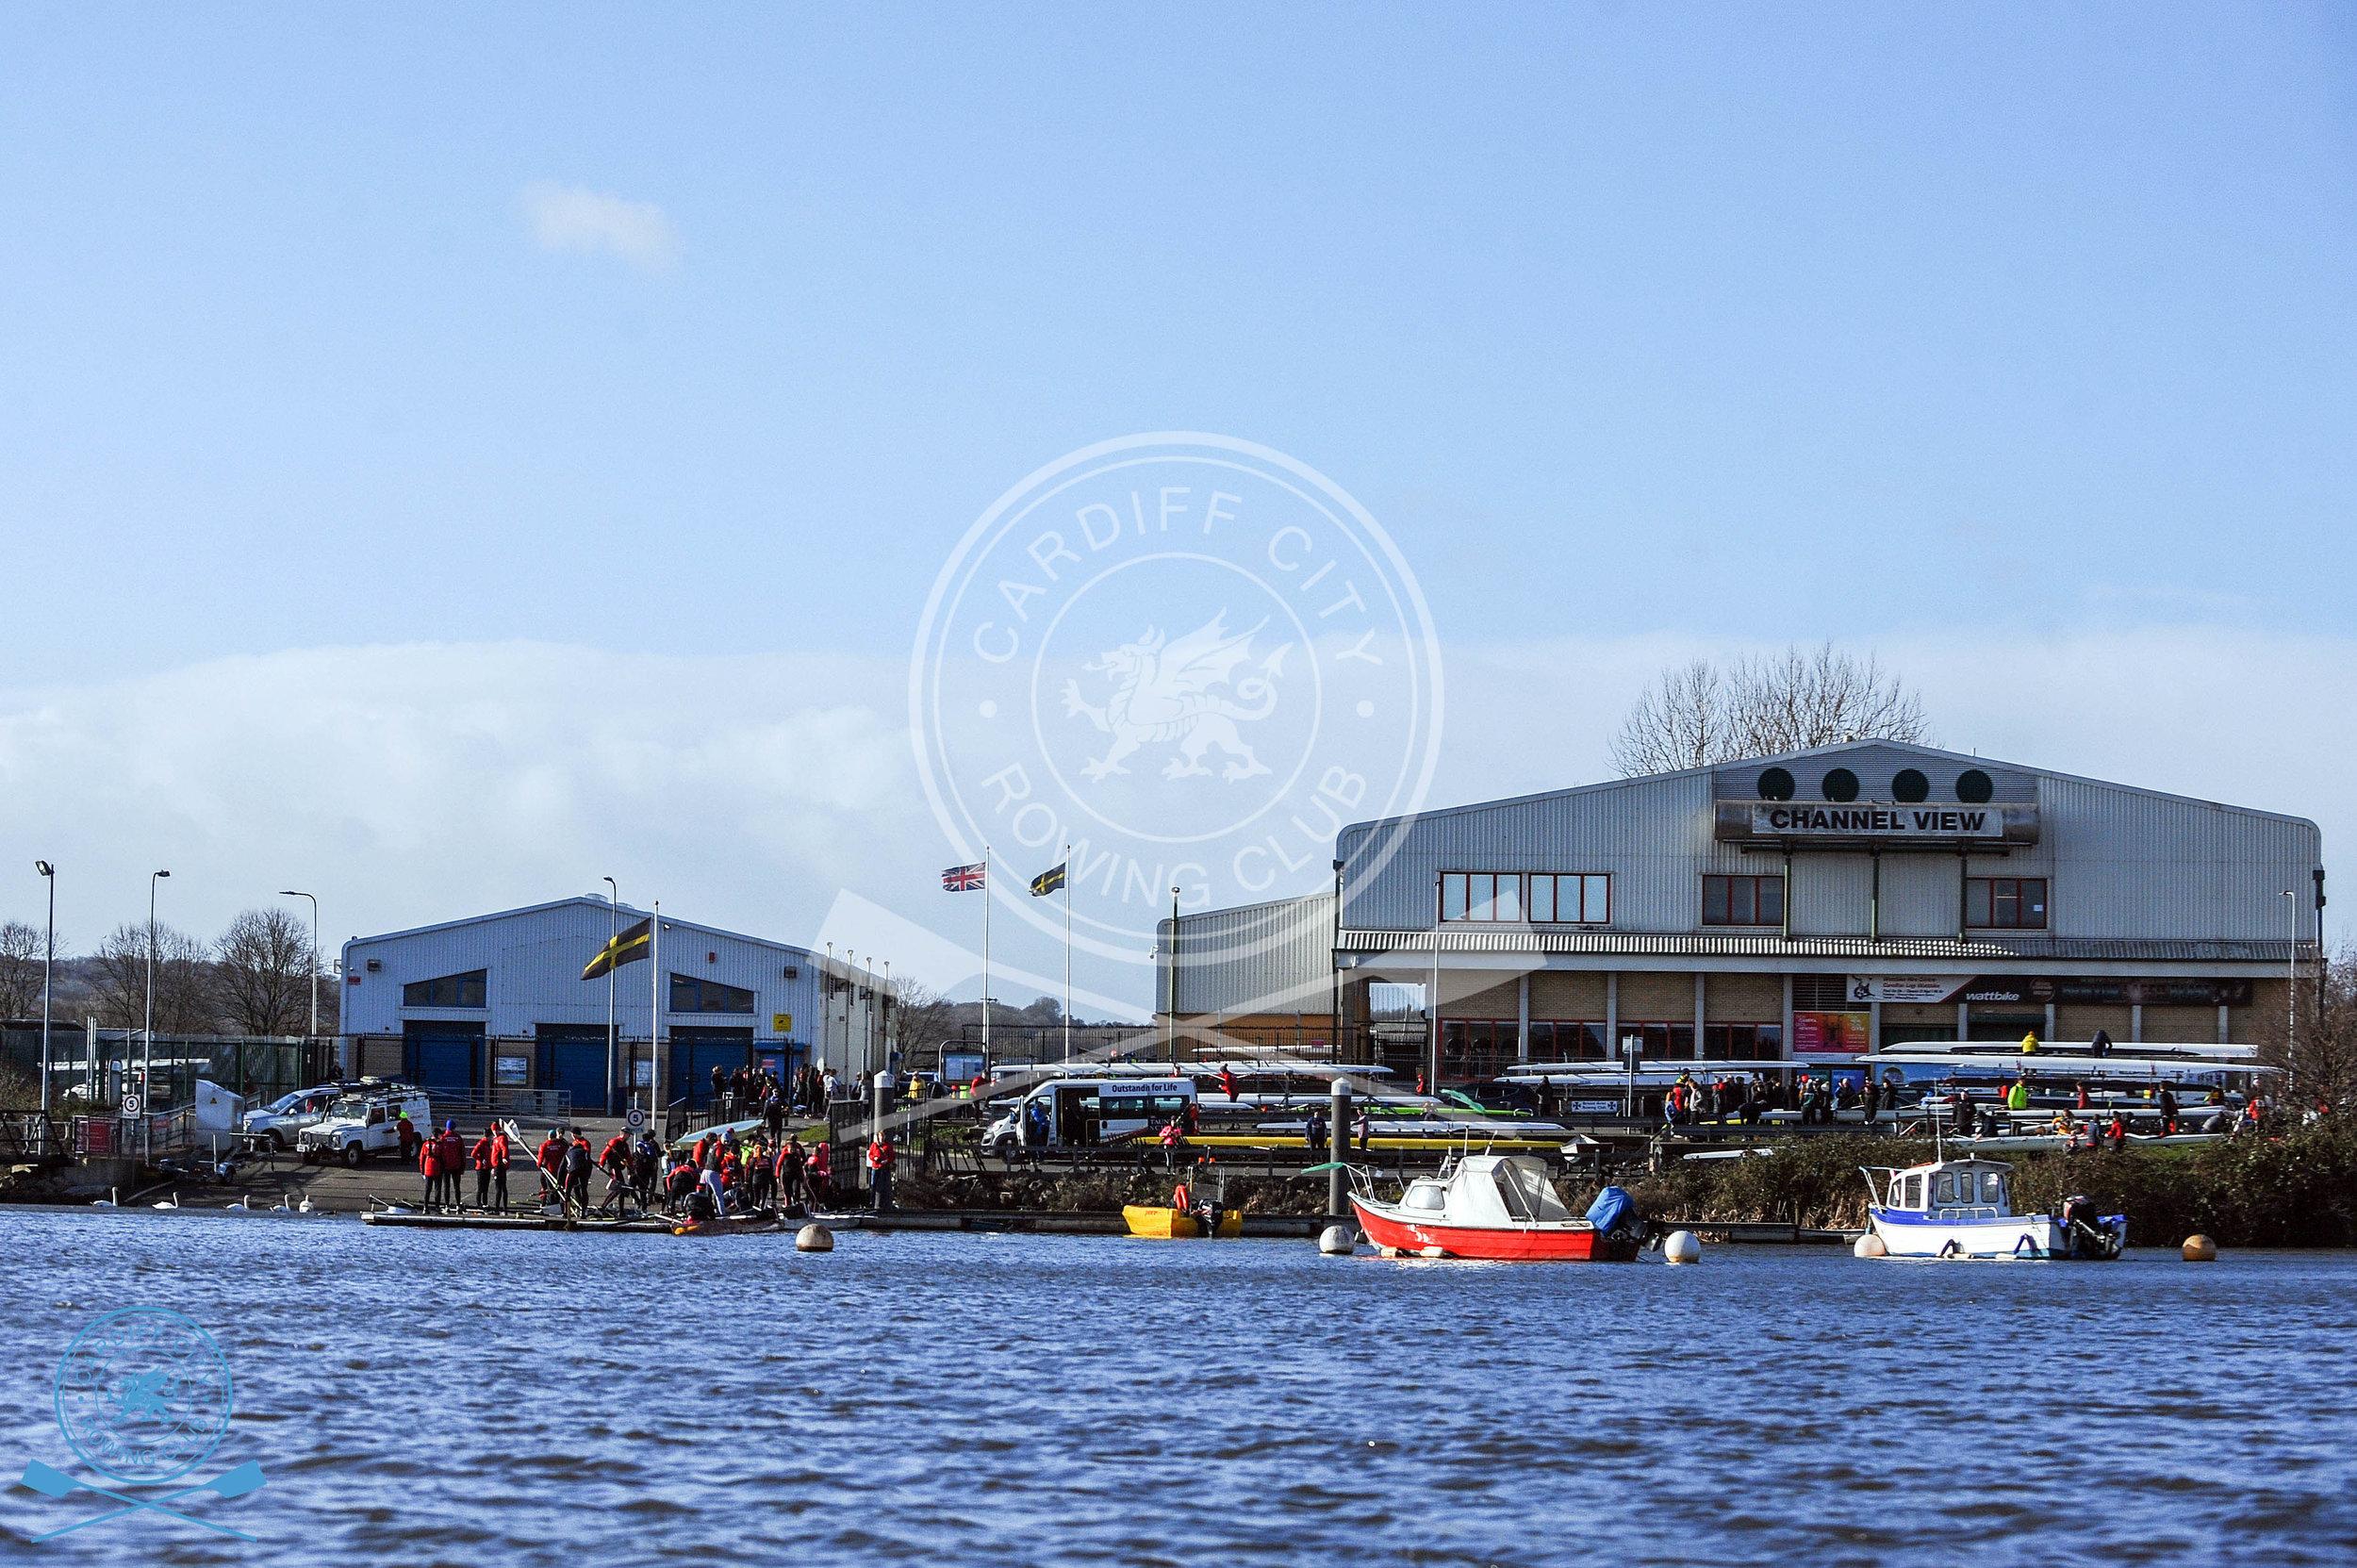 DW_280119_Cardiff_City_Rowing_252.jpg